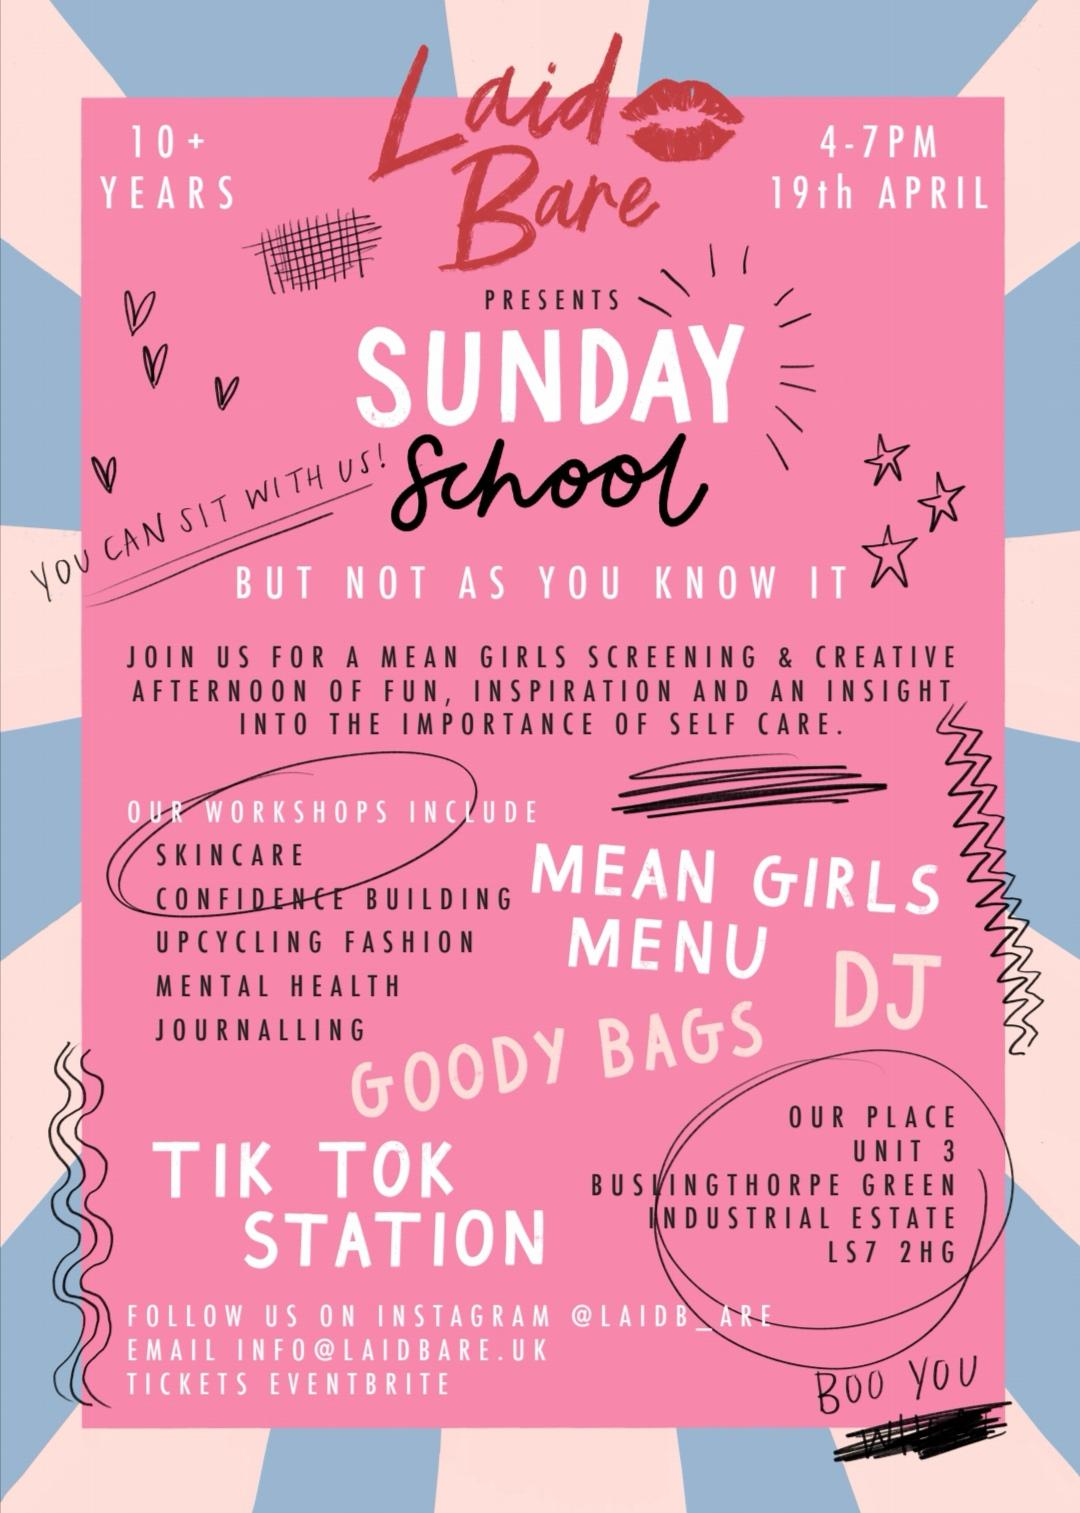 Laid Bare Sunday School